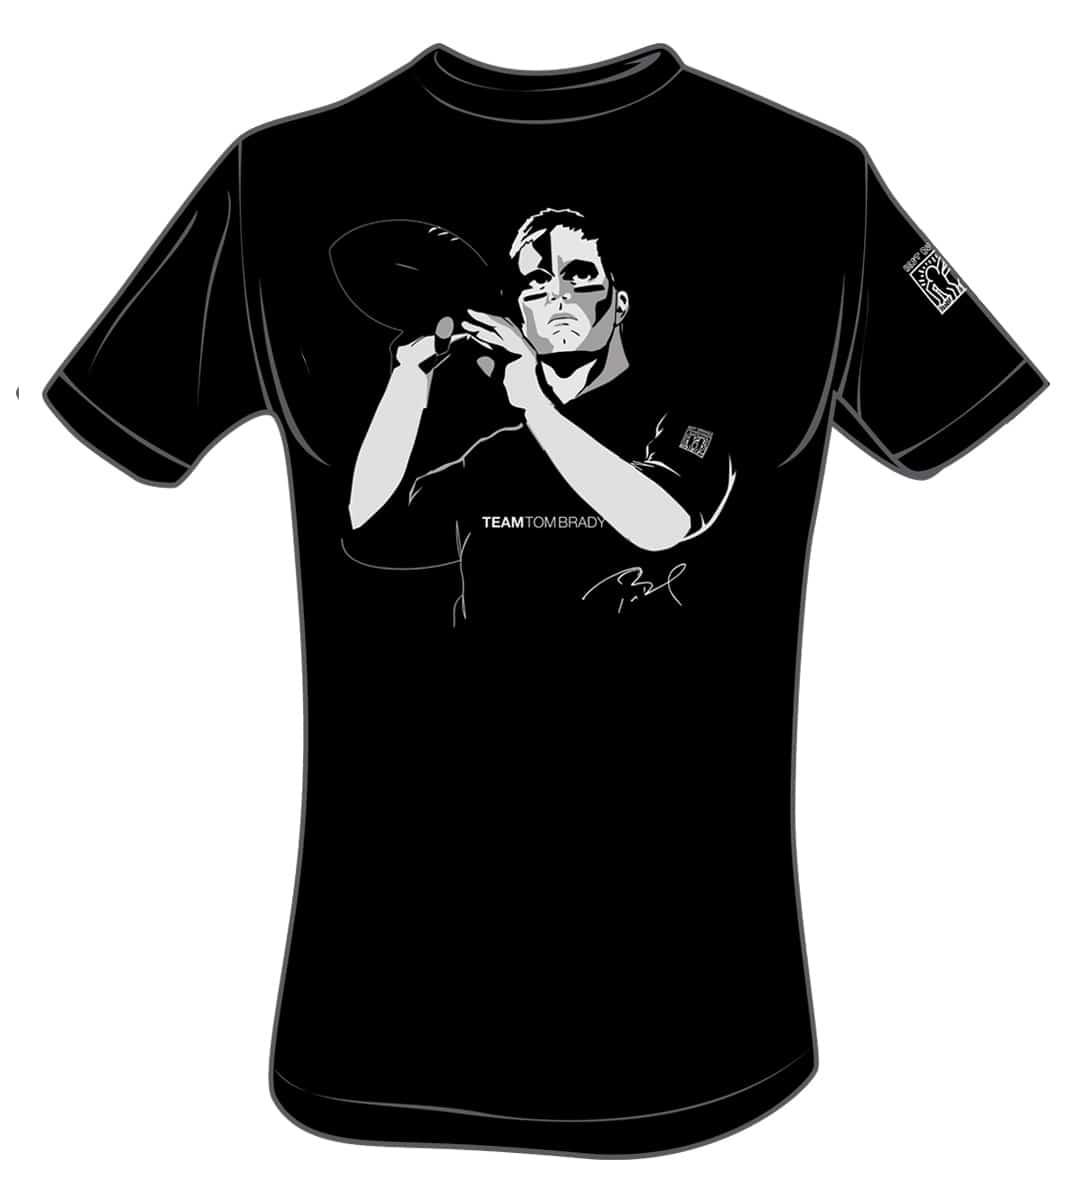 Tom Brady 2019 (T-Shirt Front)